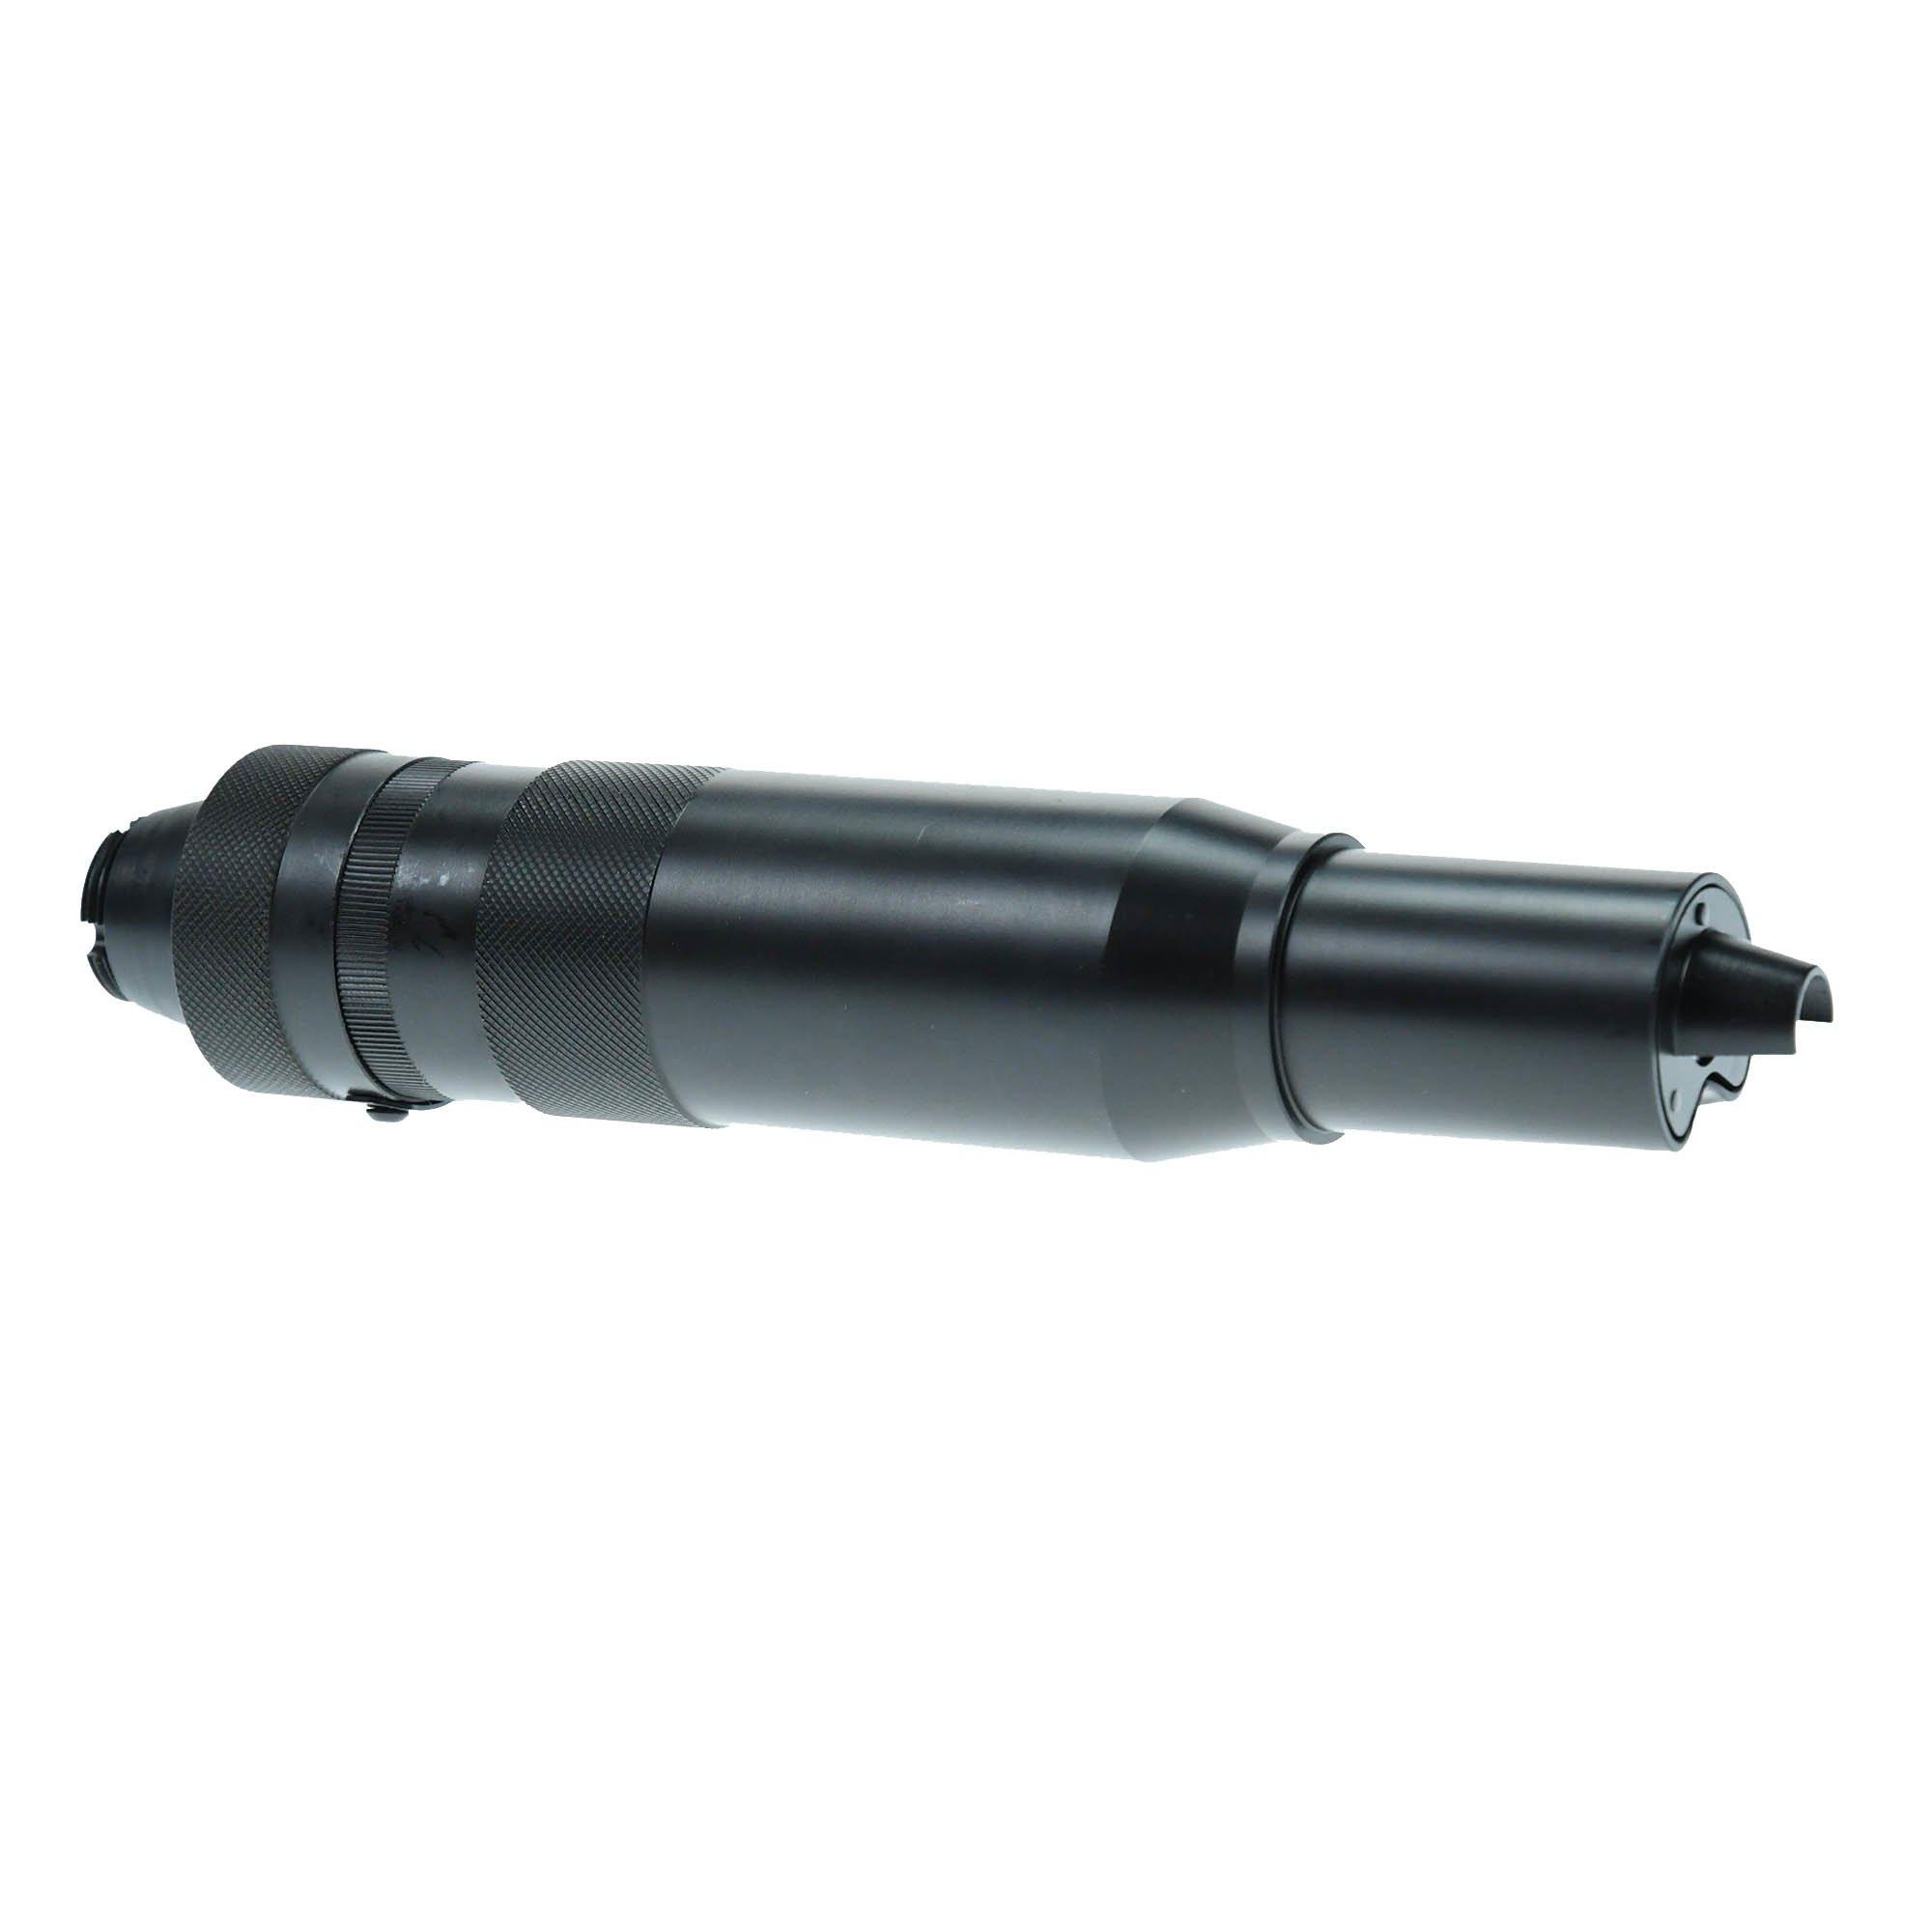 LCT PBS-4 Tracer Mock Suppressor LCT AK series - BK